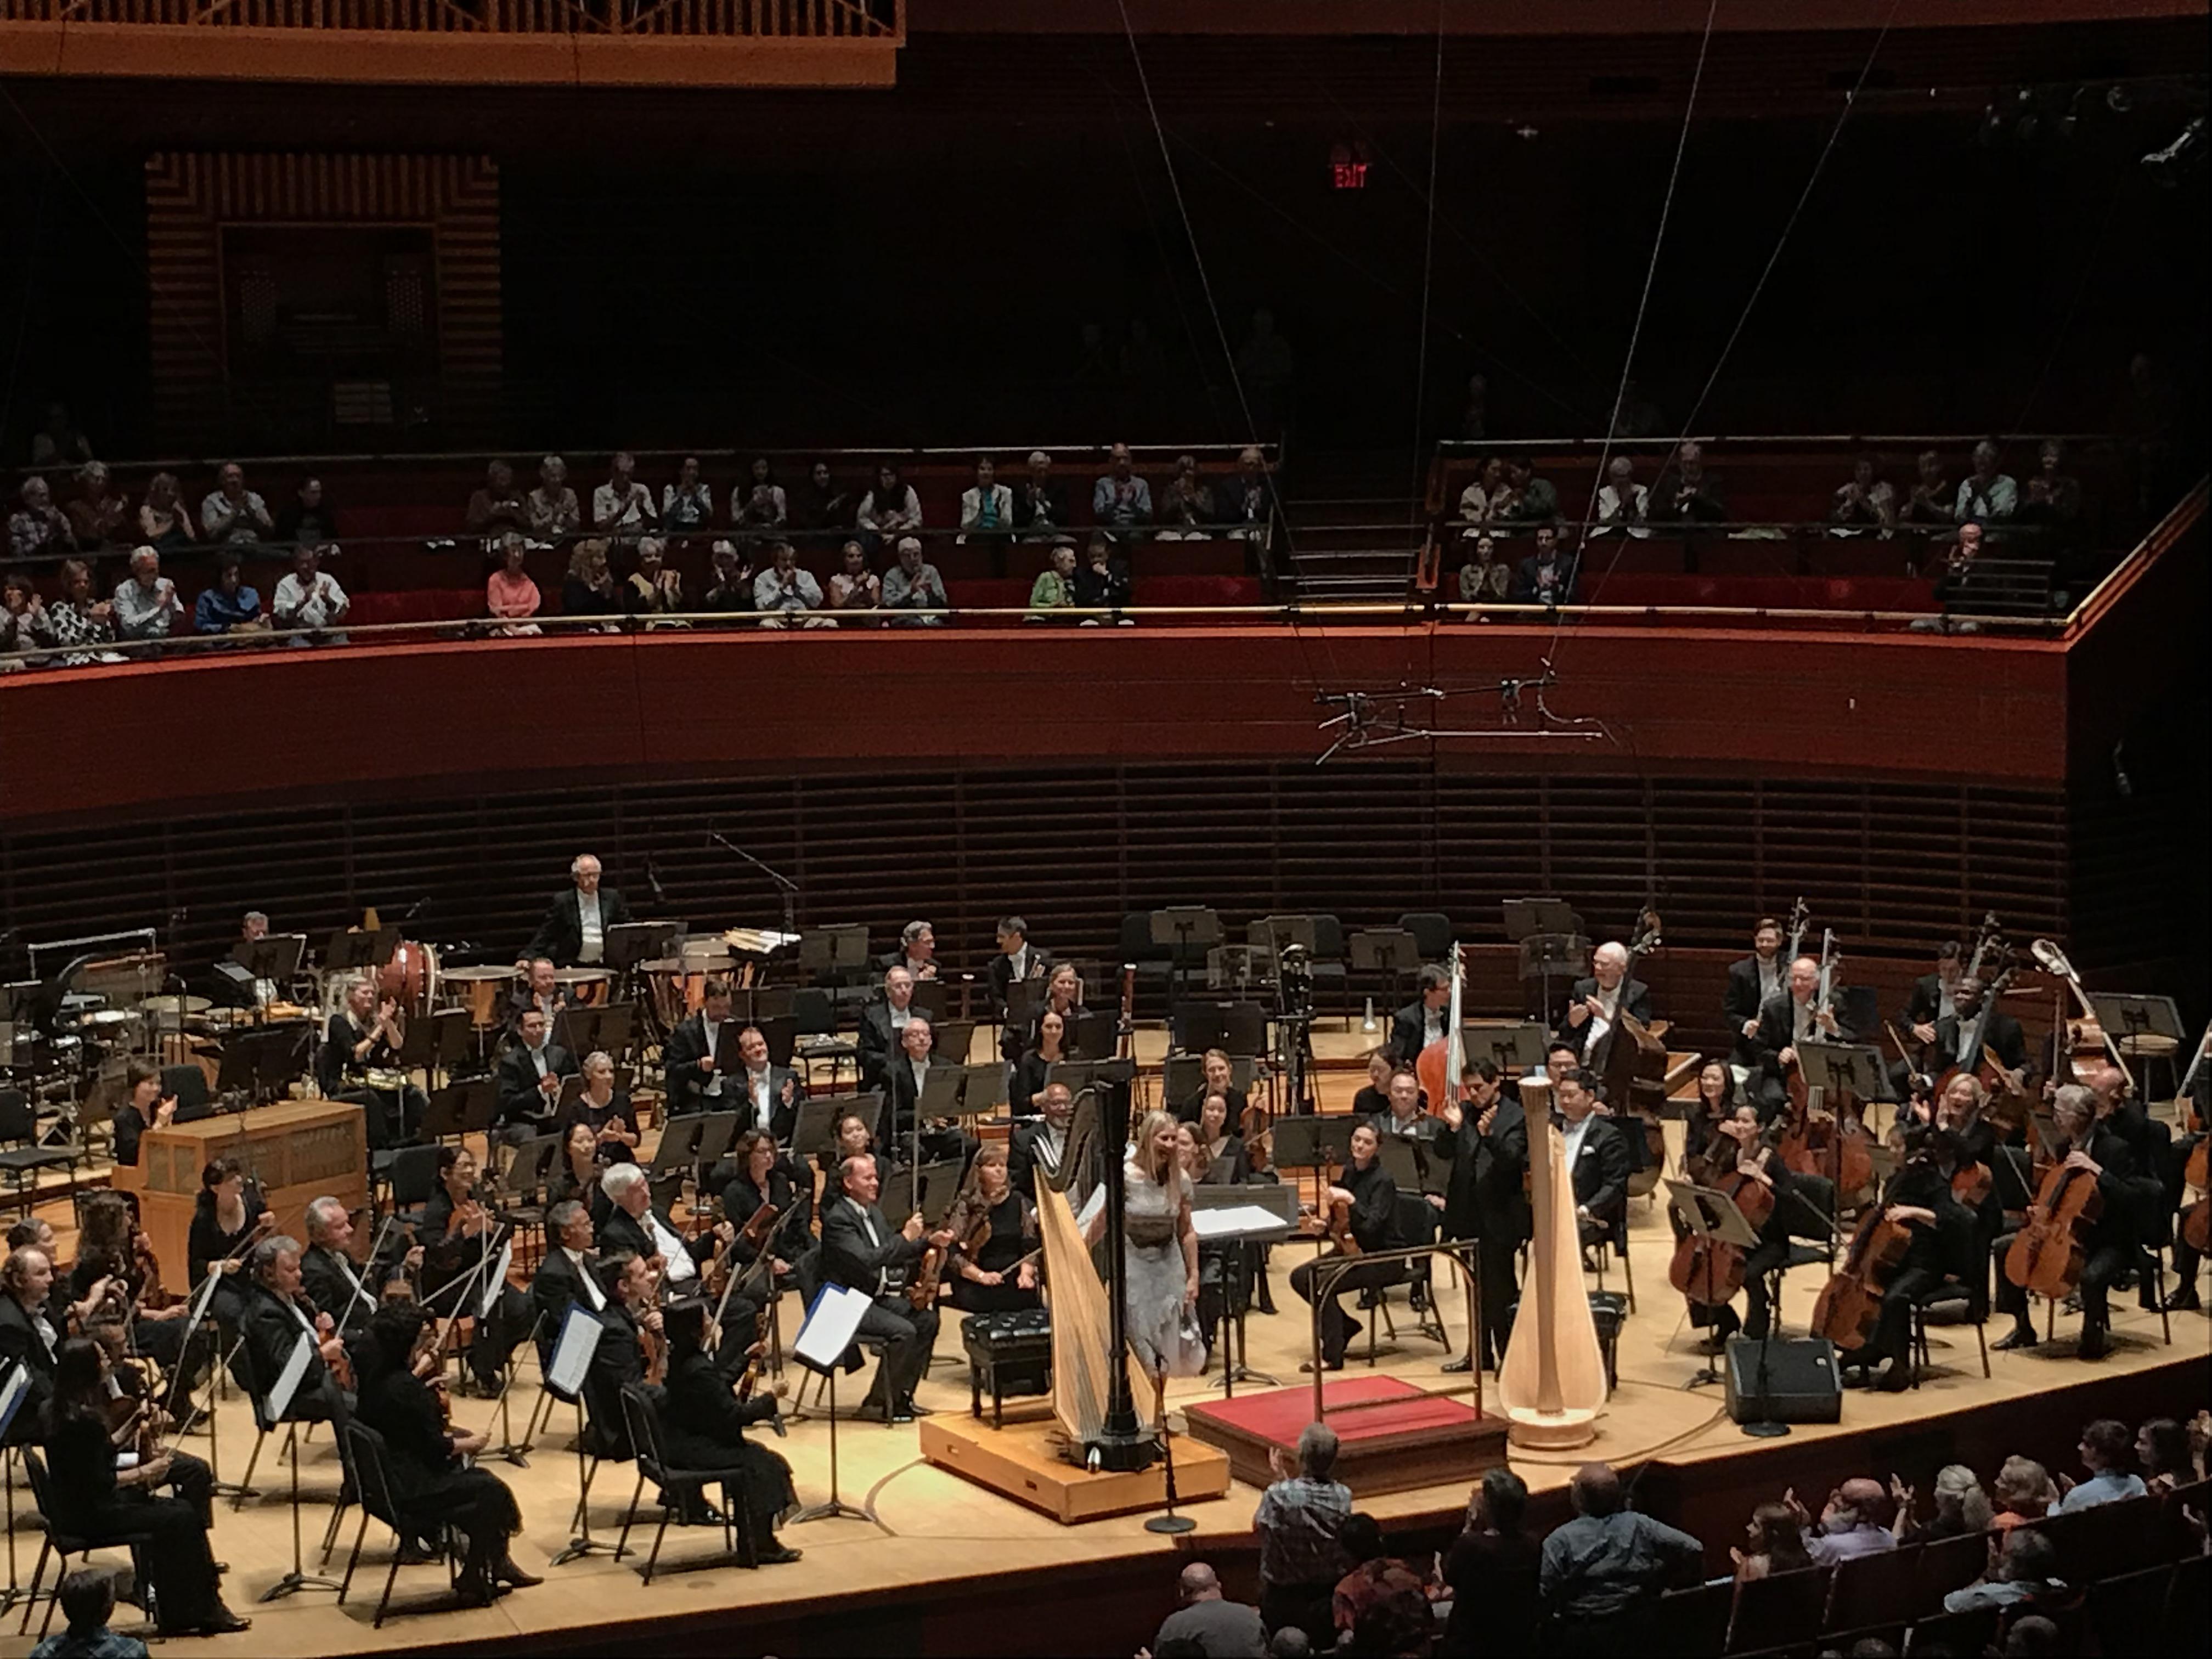 Philadelphia Orchestra principal harpist Elizabeth Hainen performed the Ginastera Harp Concerto Thursday night in Verizon Hall.